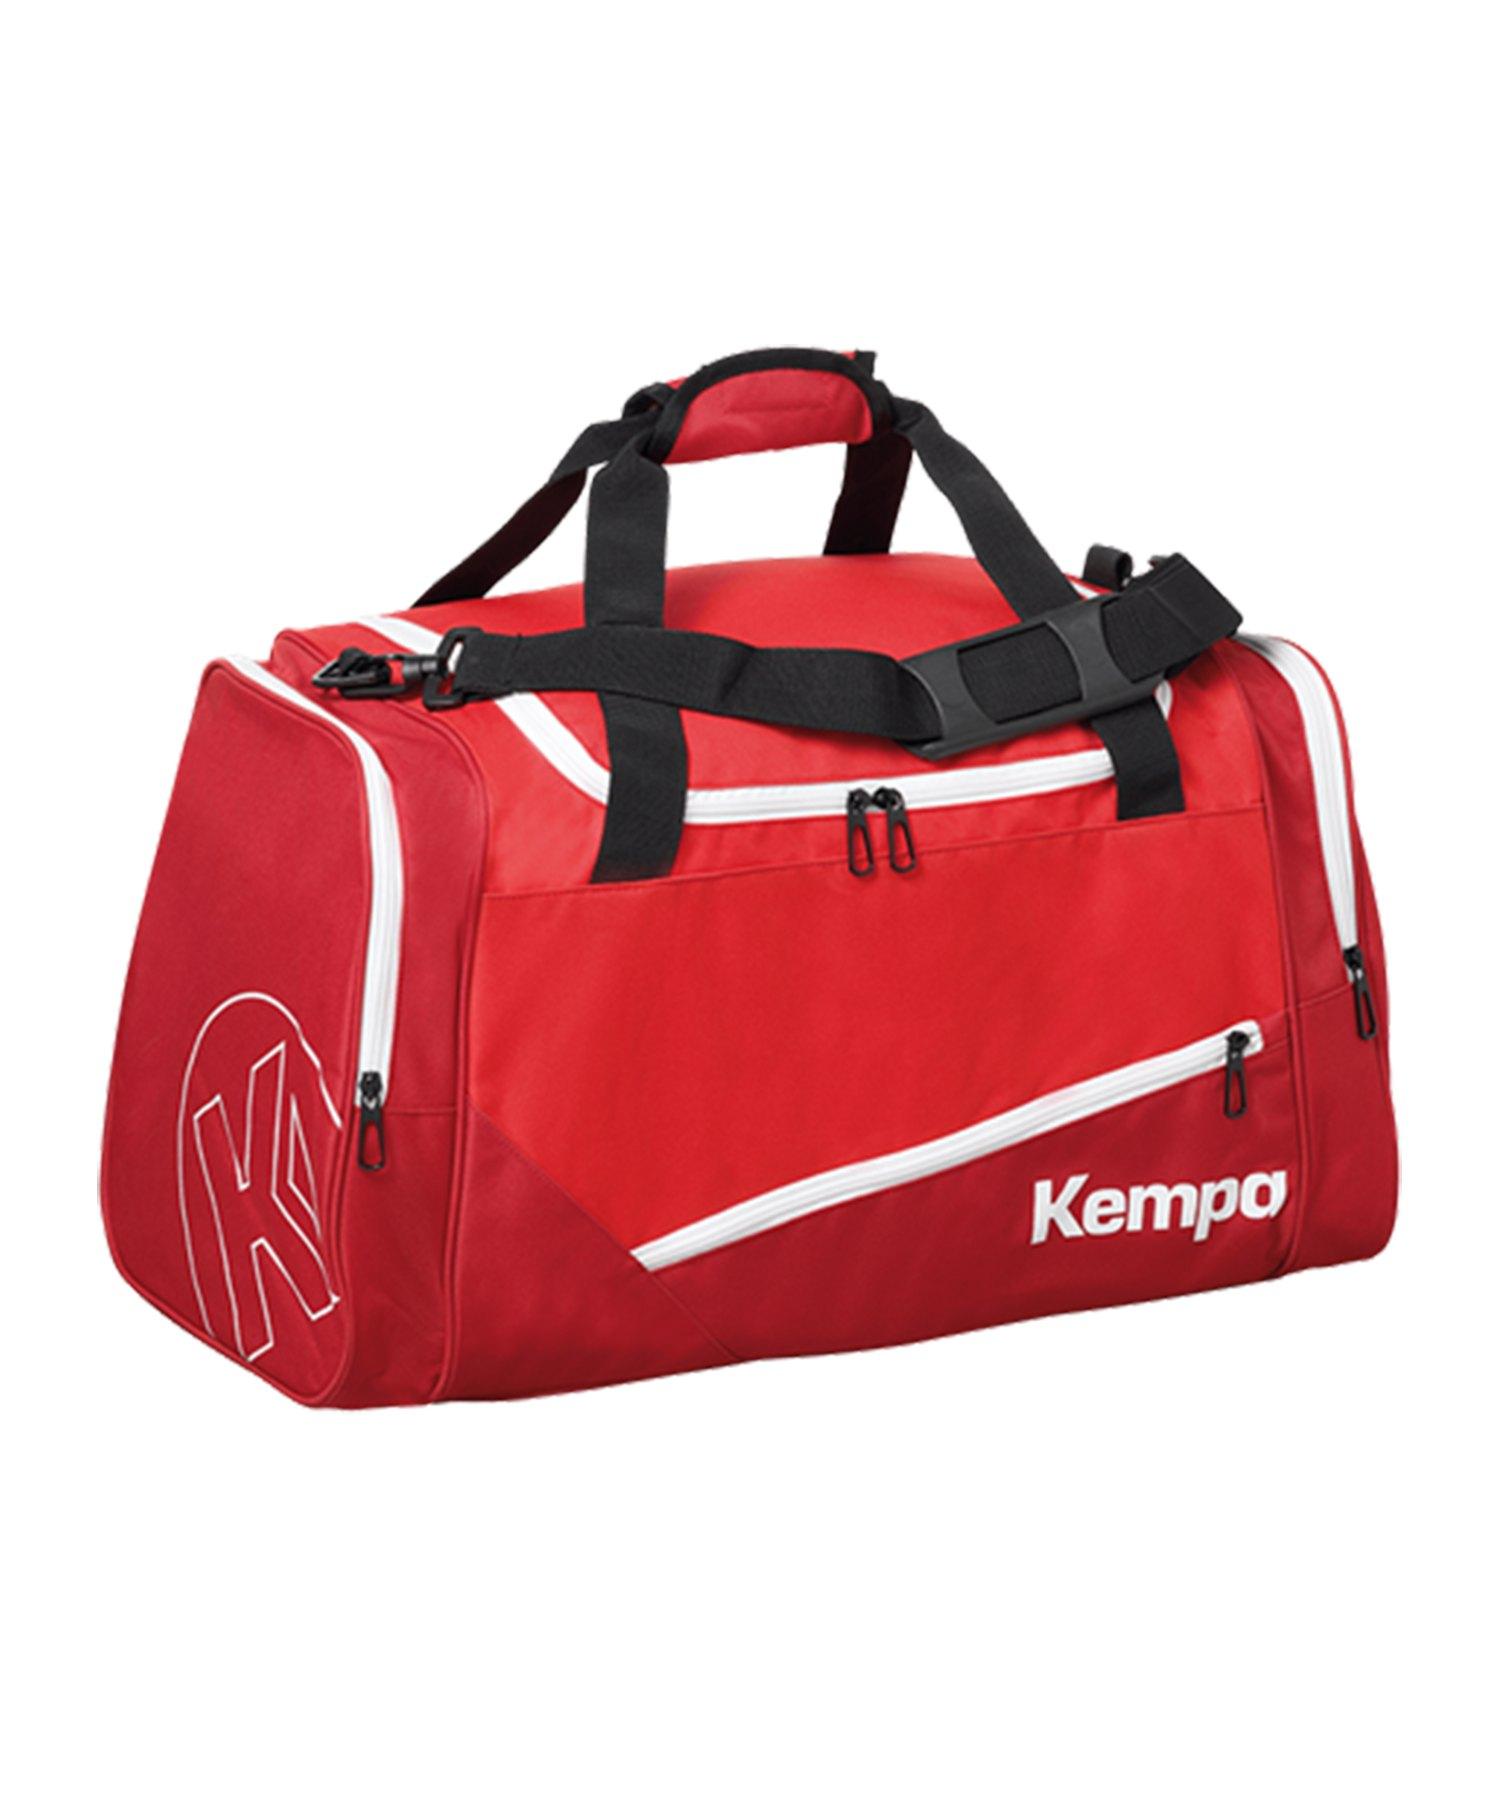 Kempa Sporttasche Größe L Rot F03 - rot